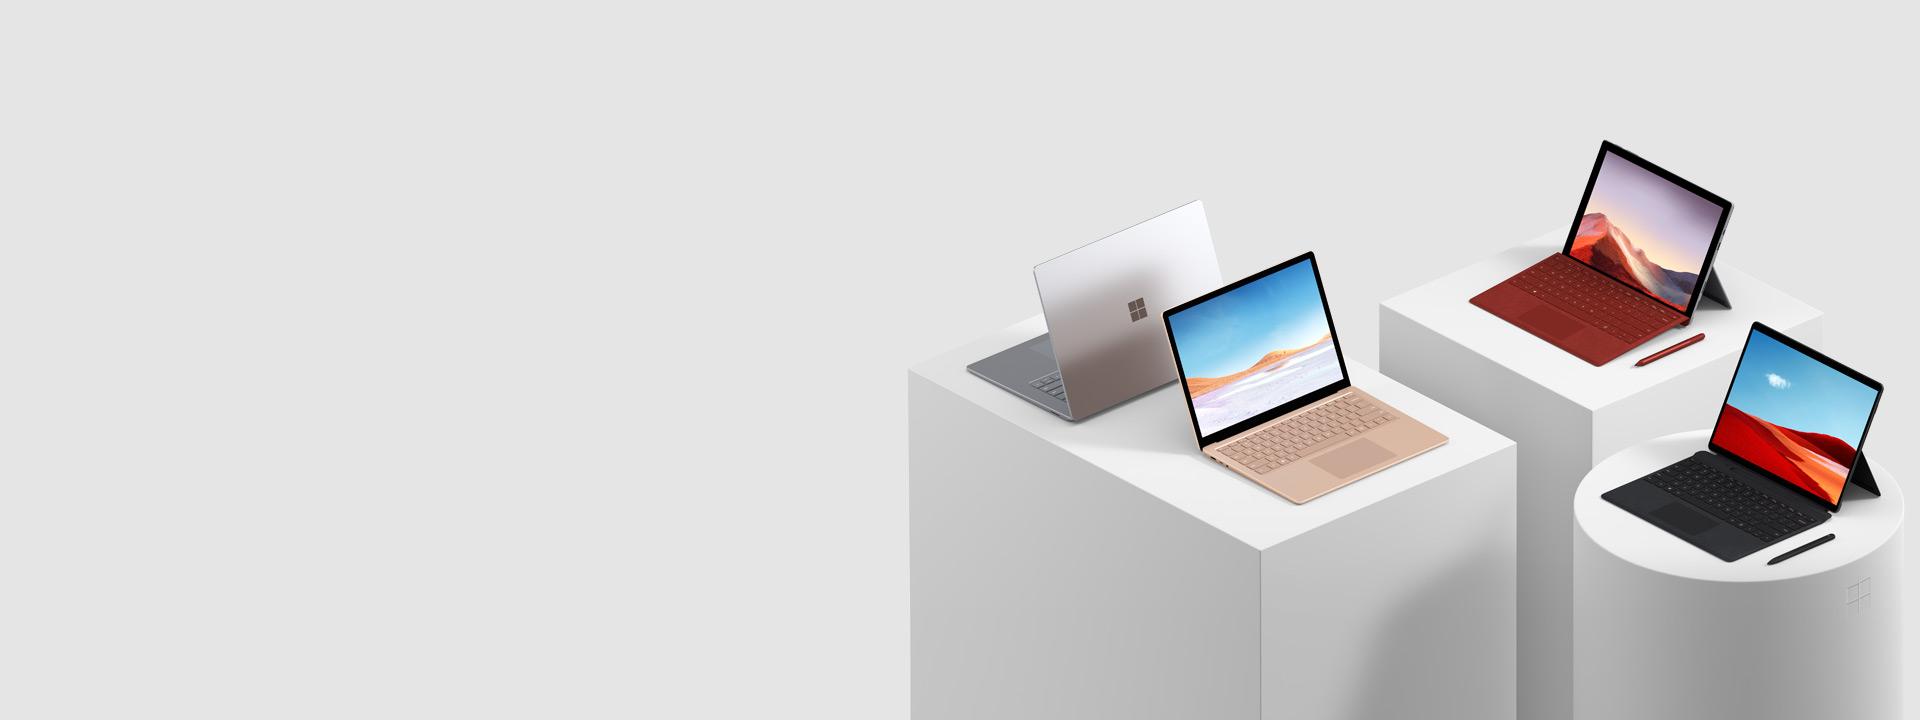 Surface 的几台电脑包括 Surface Pro 7、Surface Pro X、Surface Book 2、Surface Studio 2 和 Surface Go